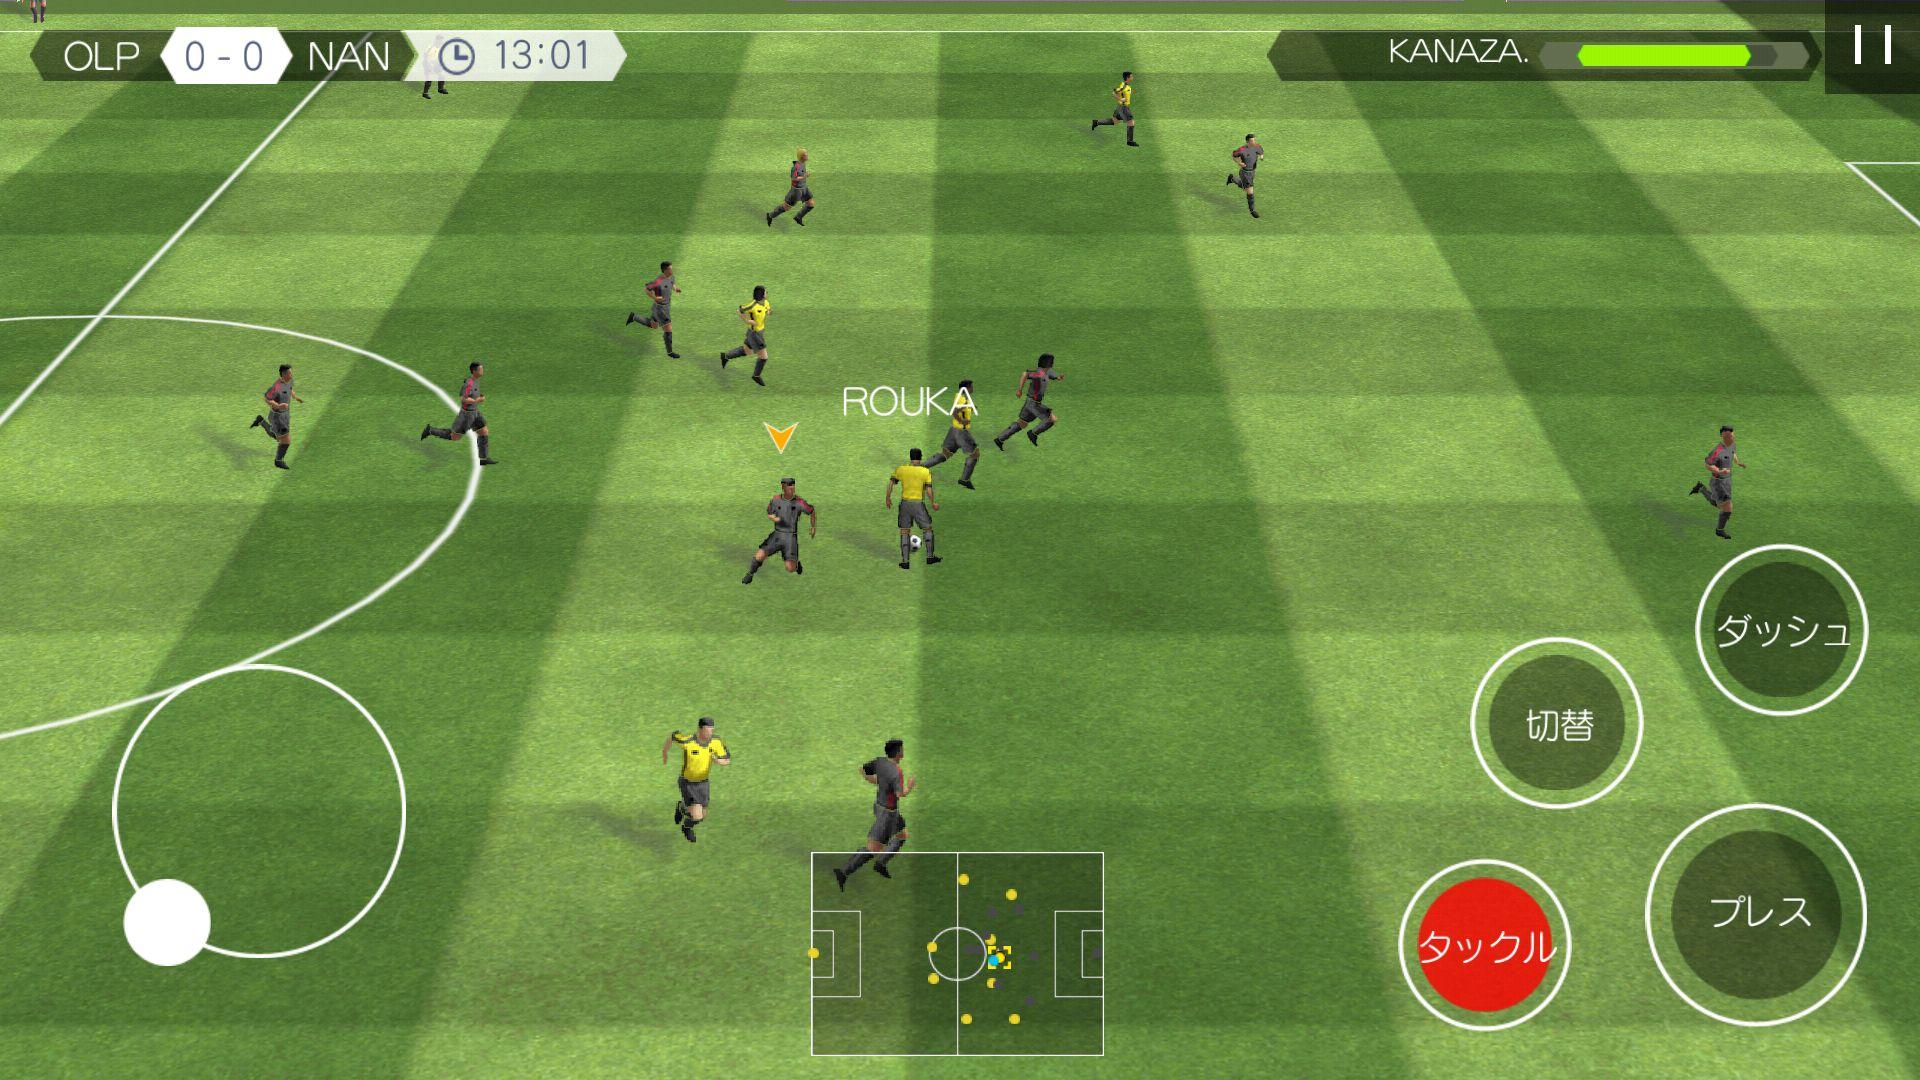 androidアプリ リアルサッカー攻略スクリーンショット2